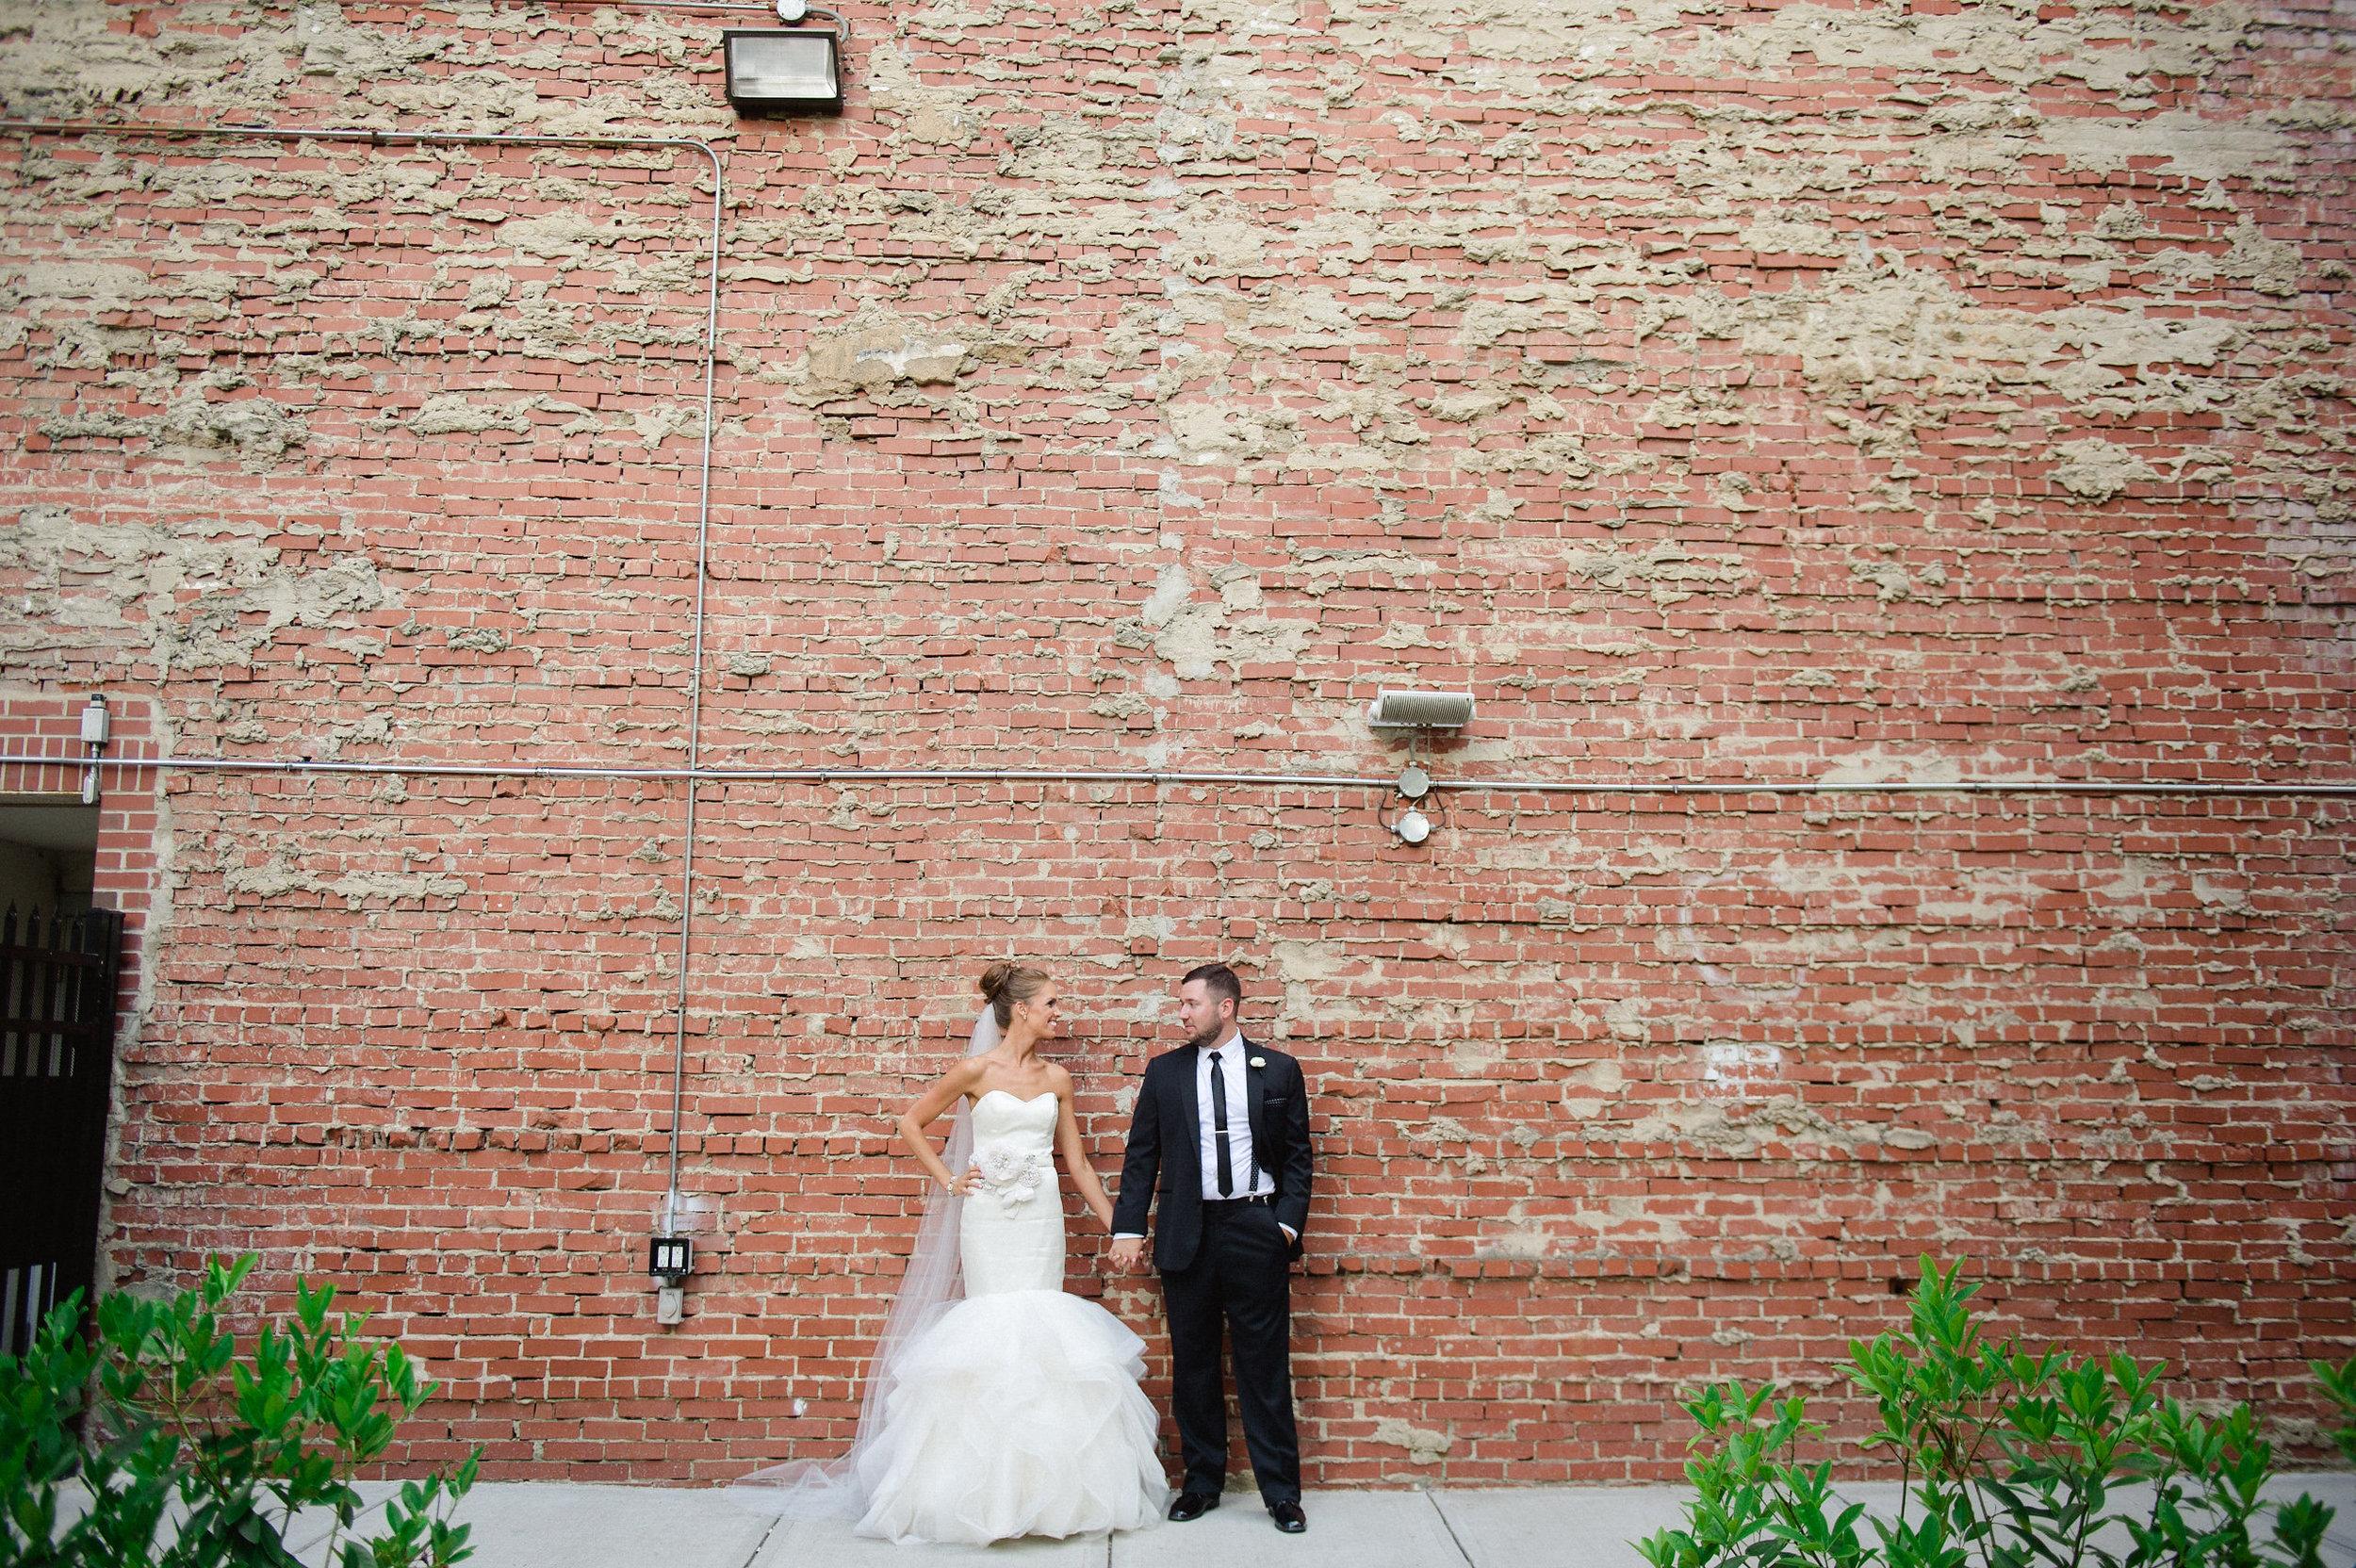 shelby&jordan|smitten&hooked|wedding|groups-153.jpg